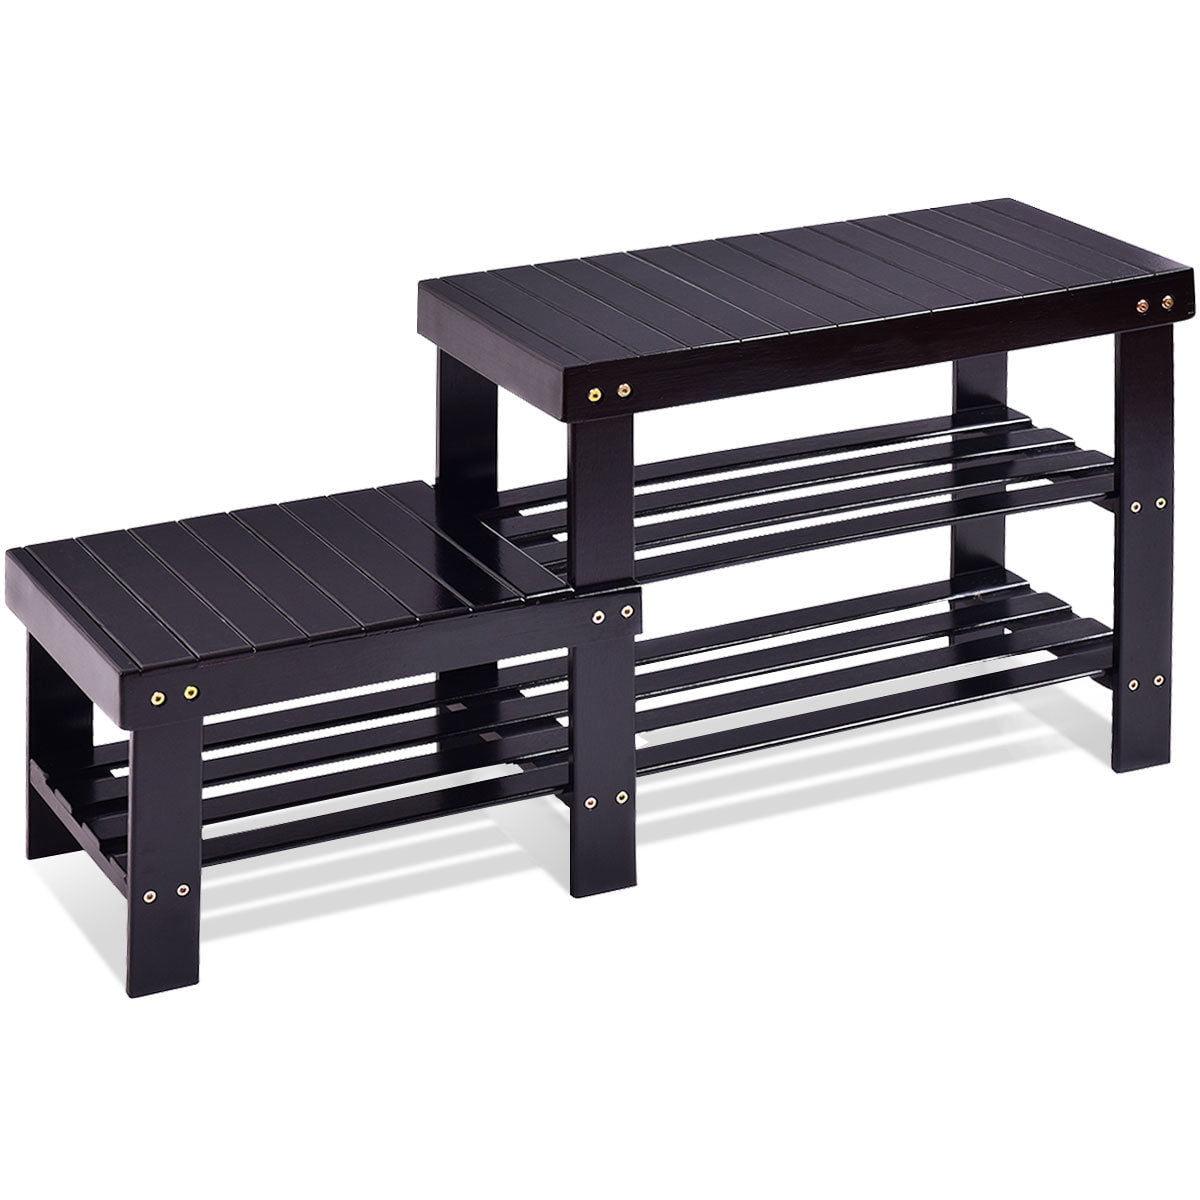 2 -Tier Bamboo Shoe Bench Boot Storage Racks Shelf Organizer Chair Seat Black